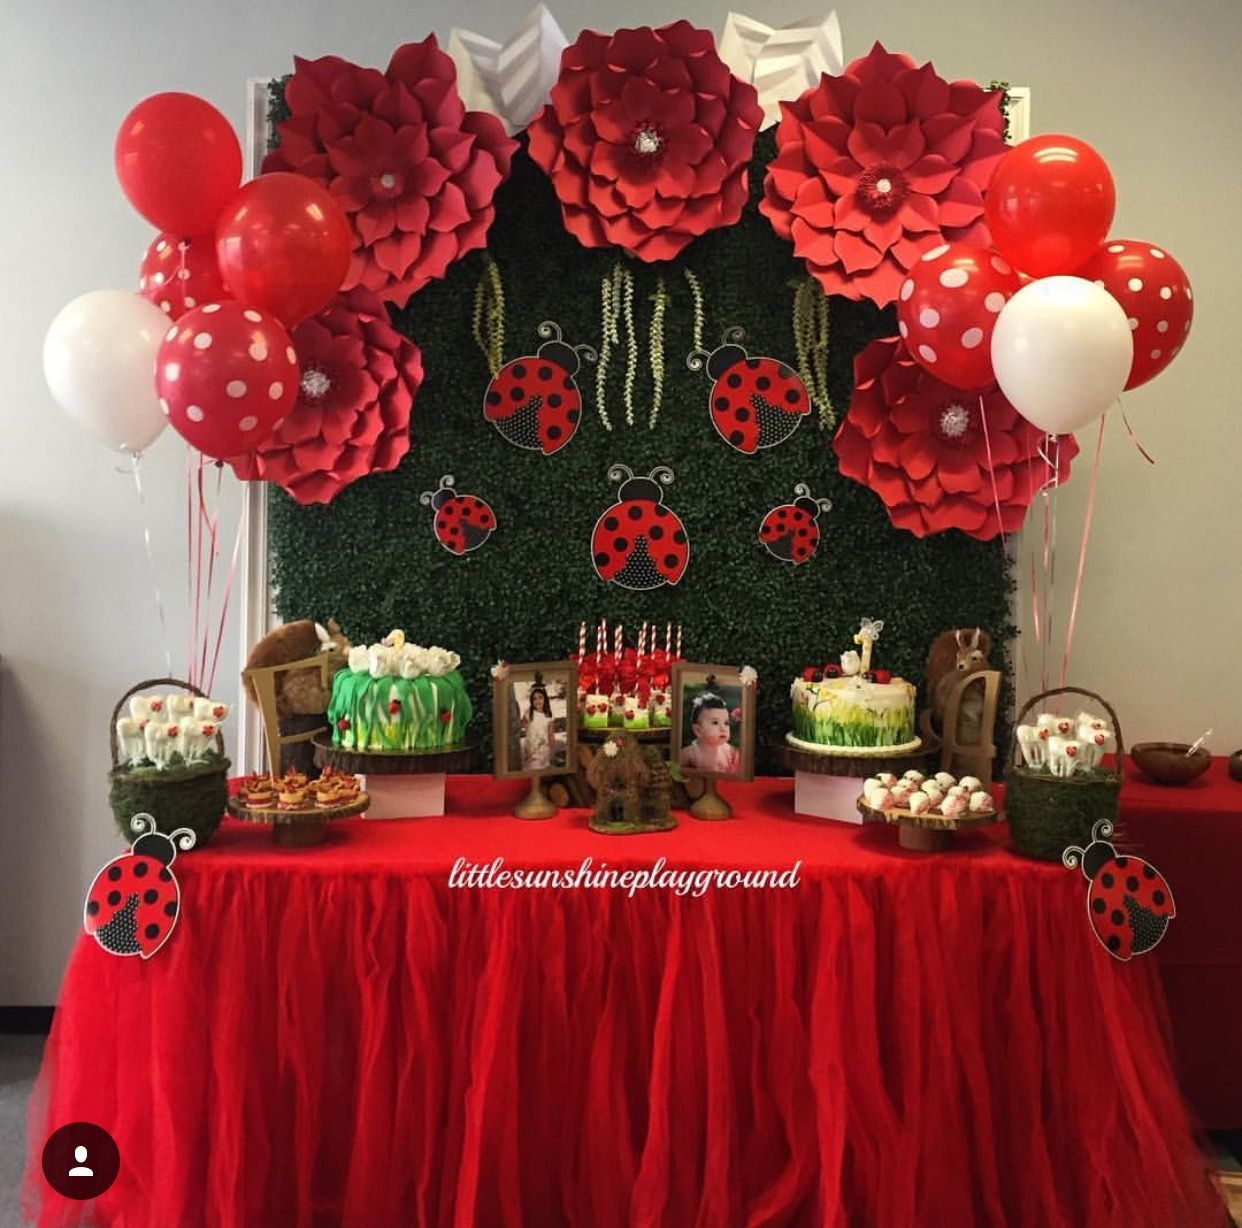 Ladybug Table Decorations